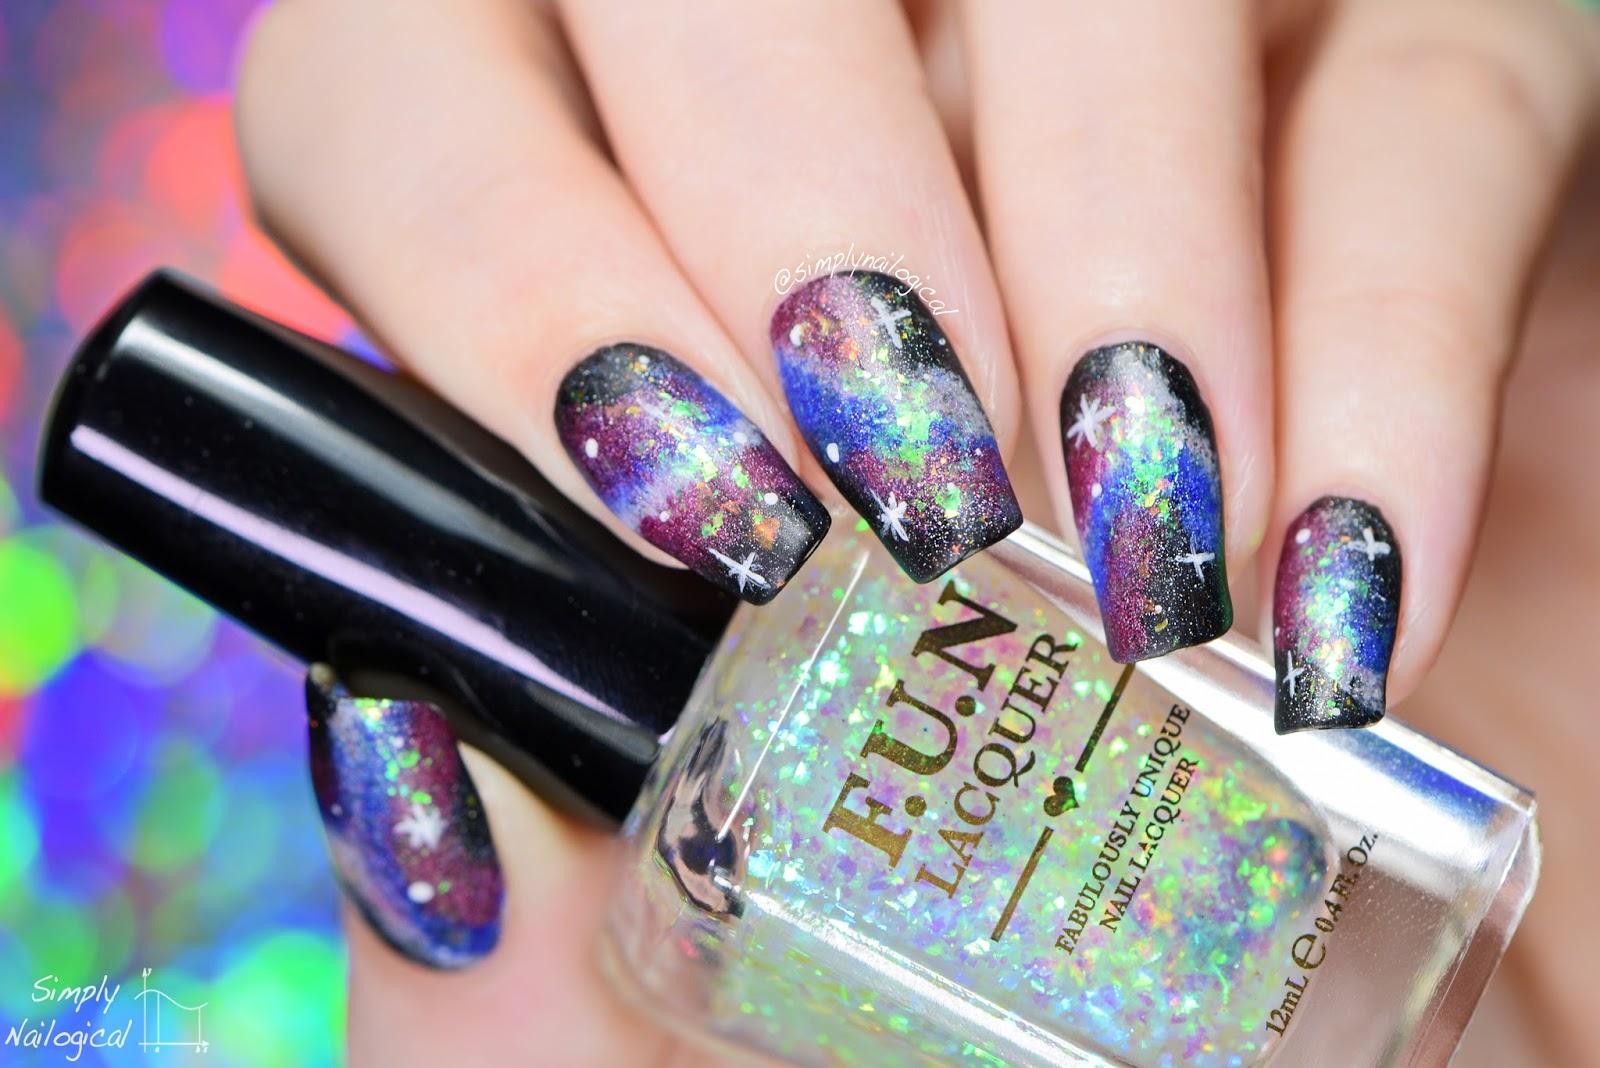 Simply Nailogical: Galaxy nail art with holo and flakies